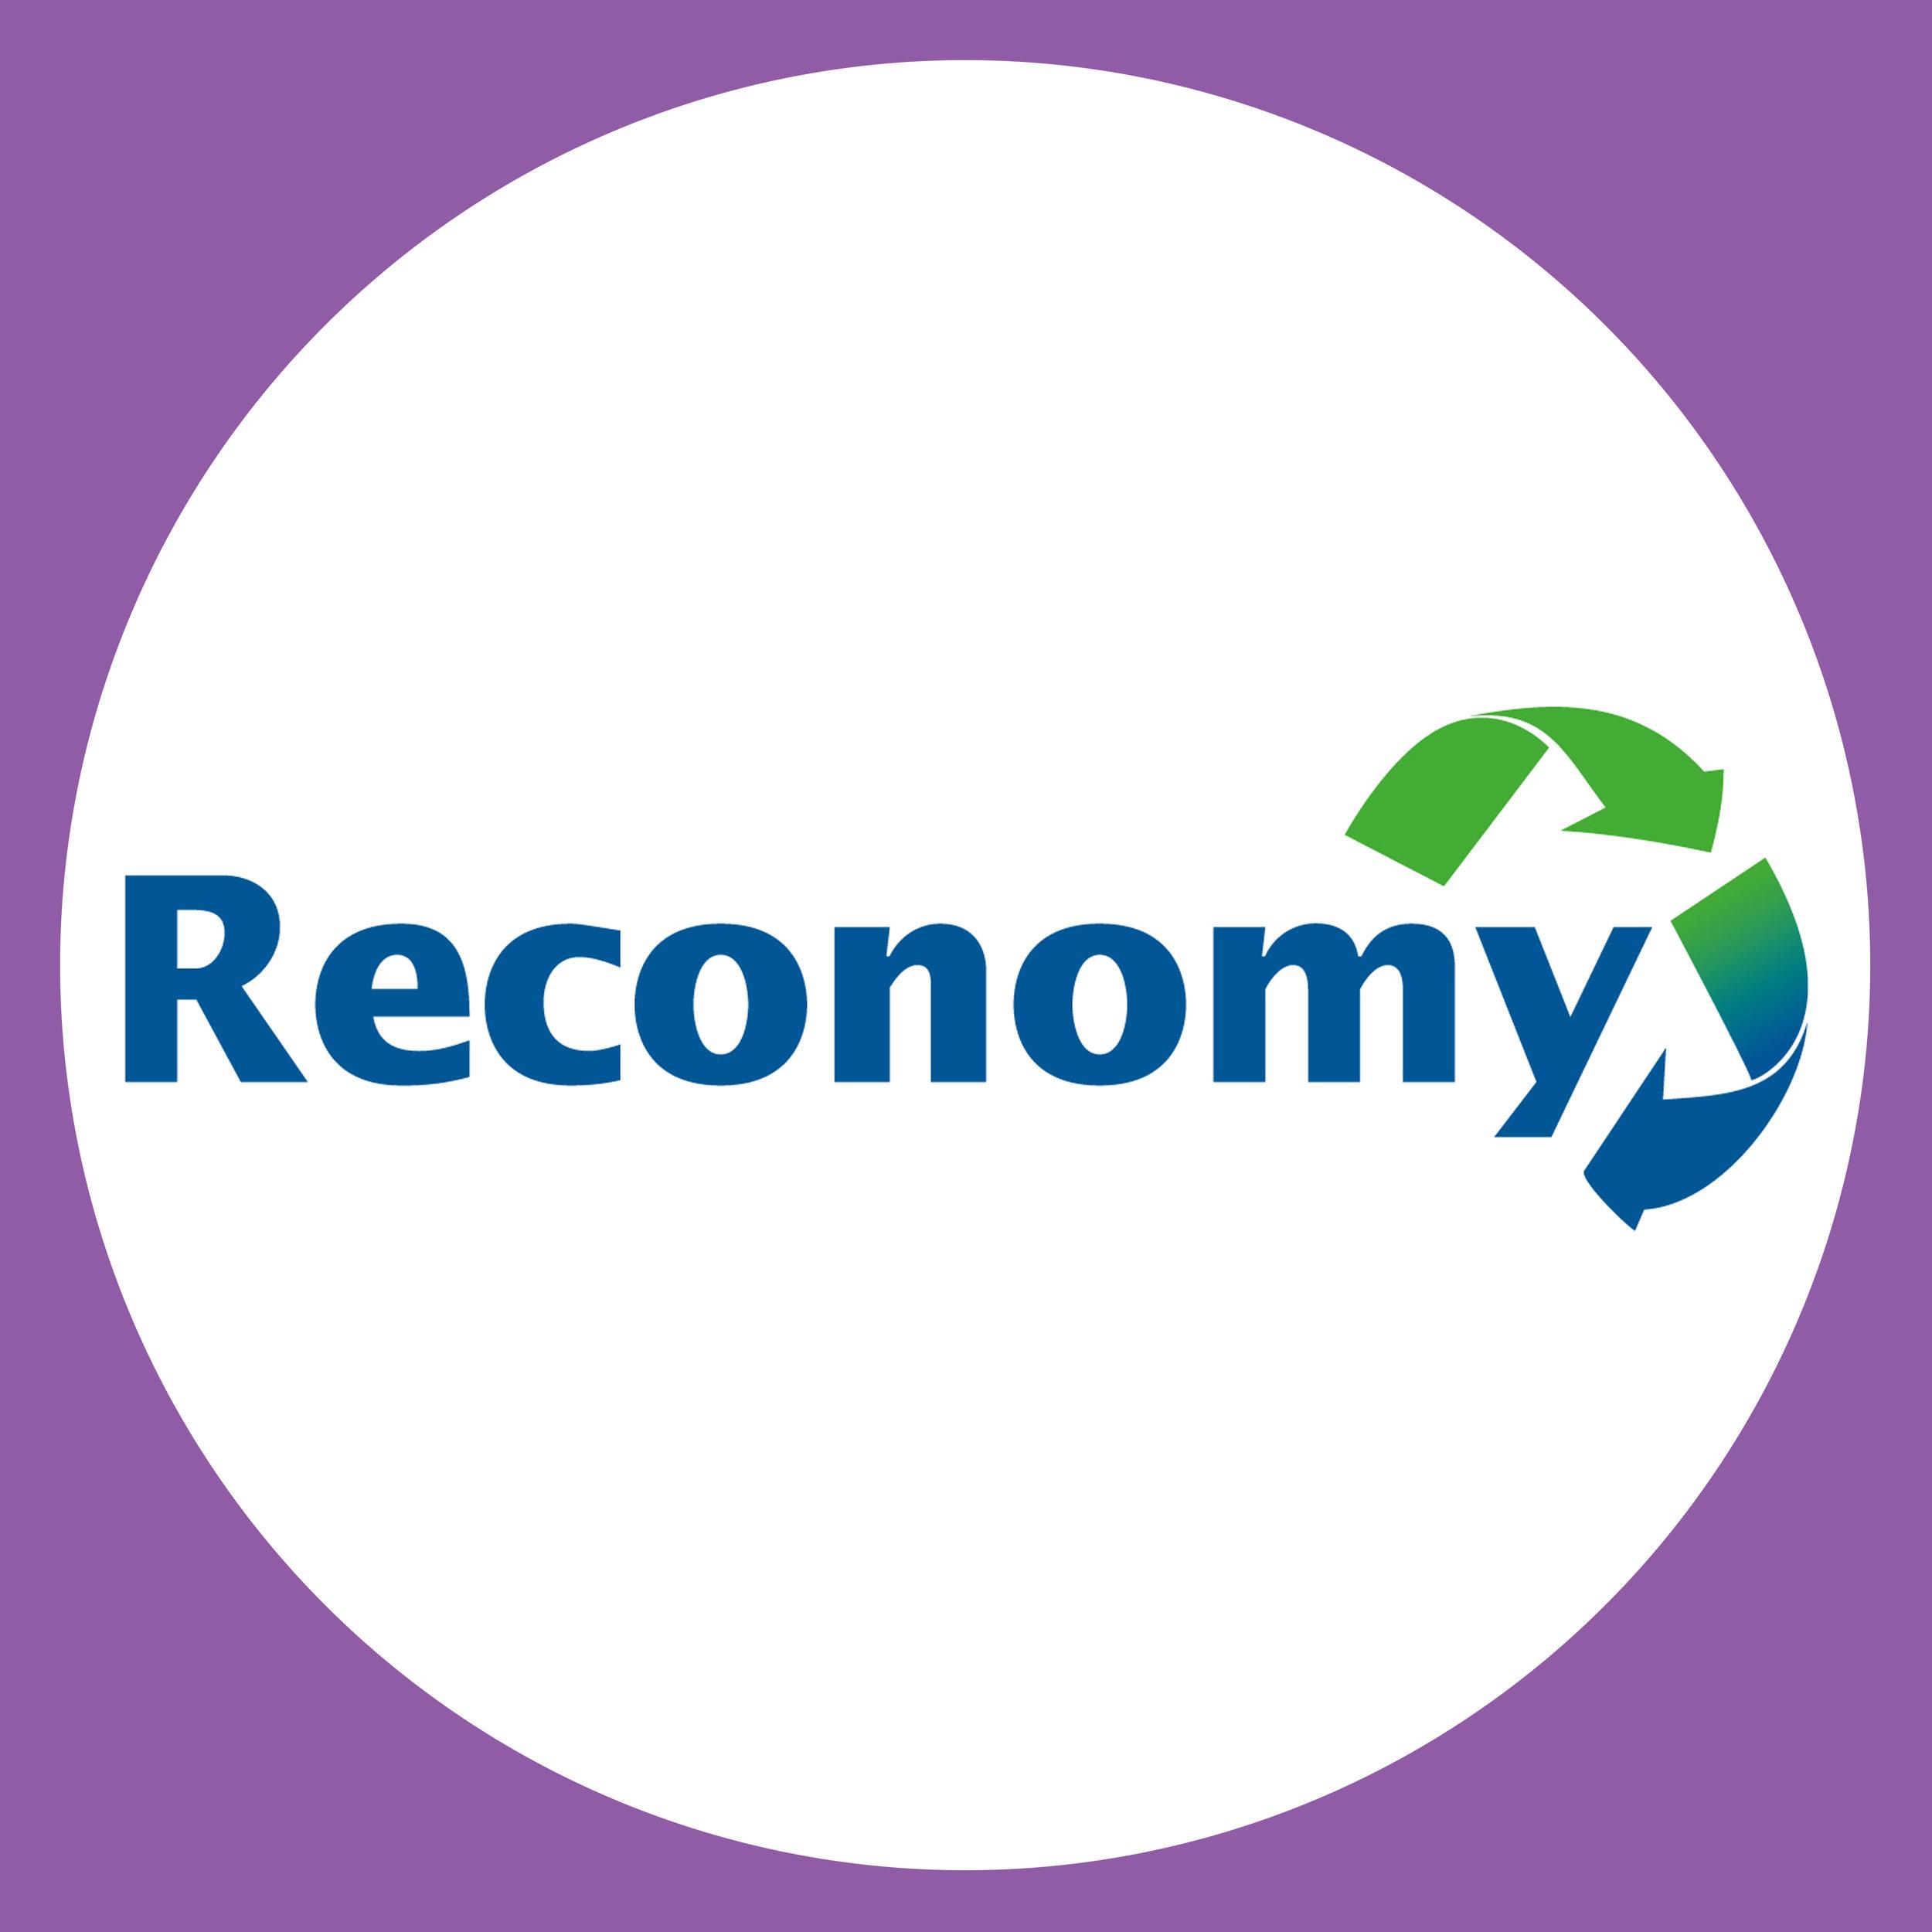 Reconomy logo in circle_RGB (3).jpg